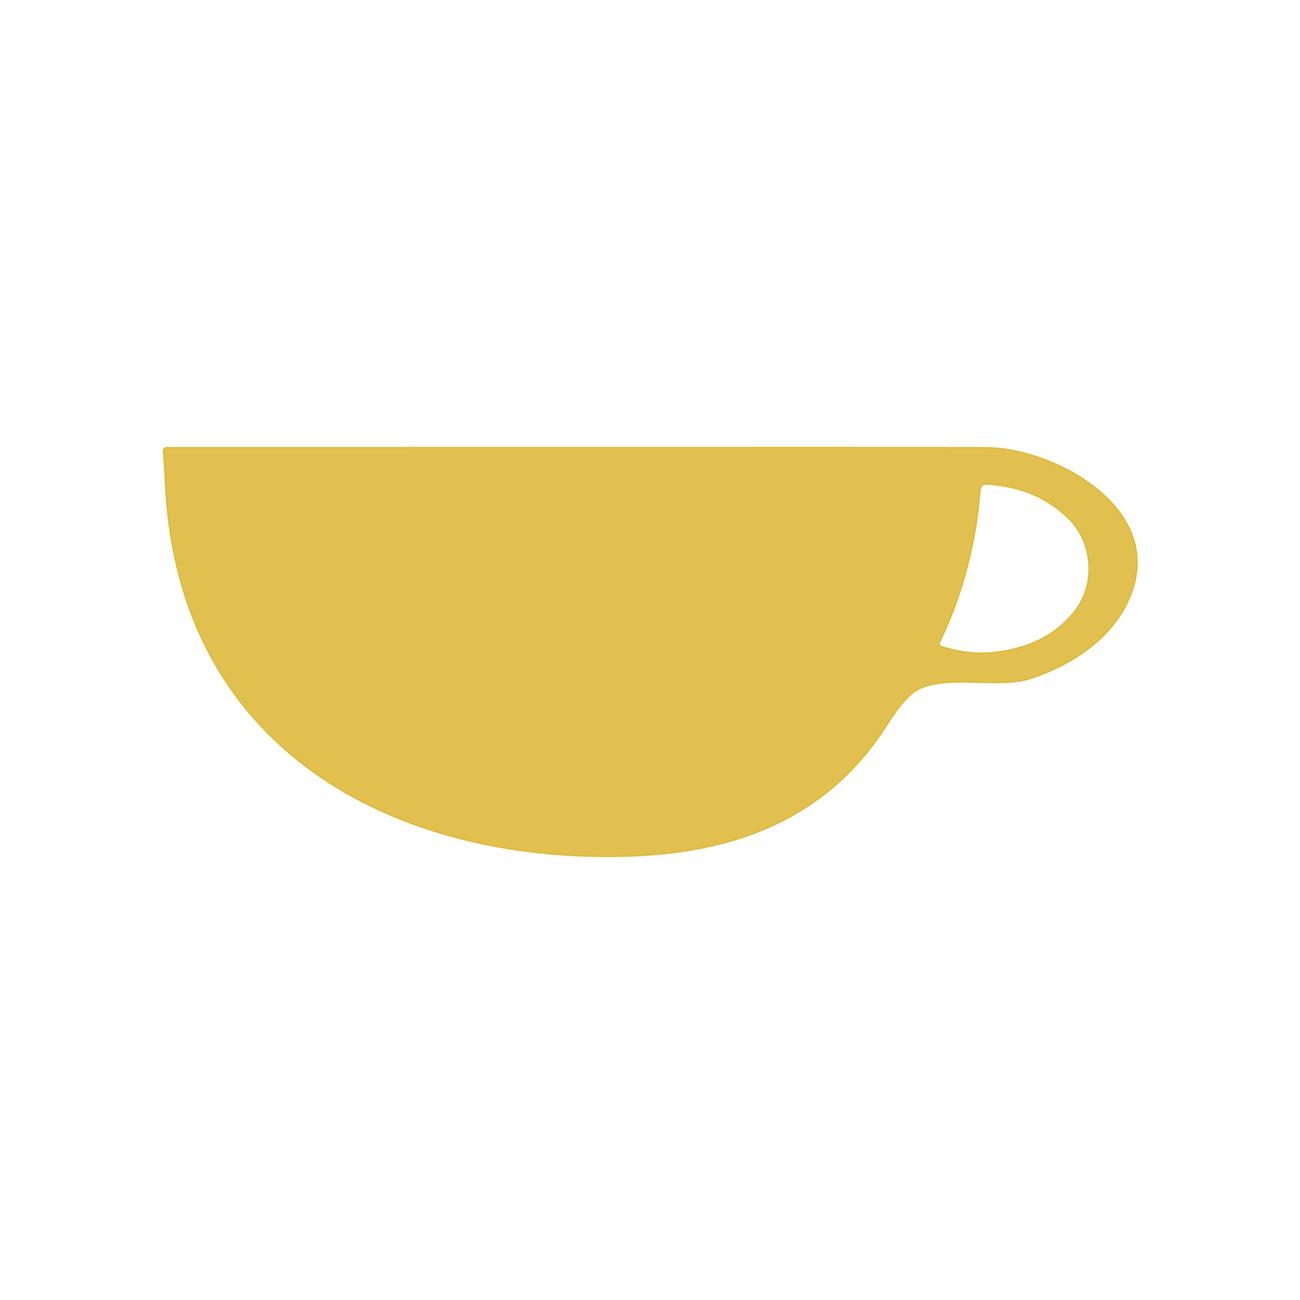 tea_cup_icon_social_media_profile.jpg